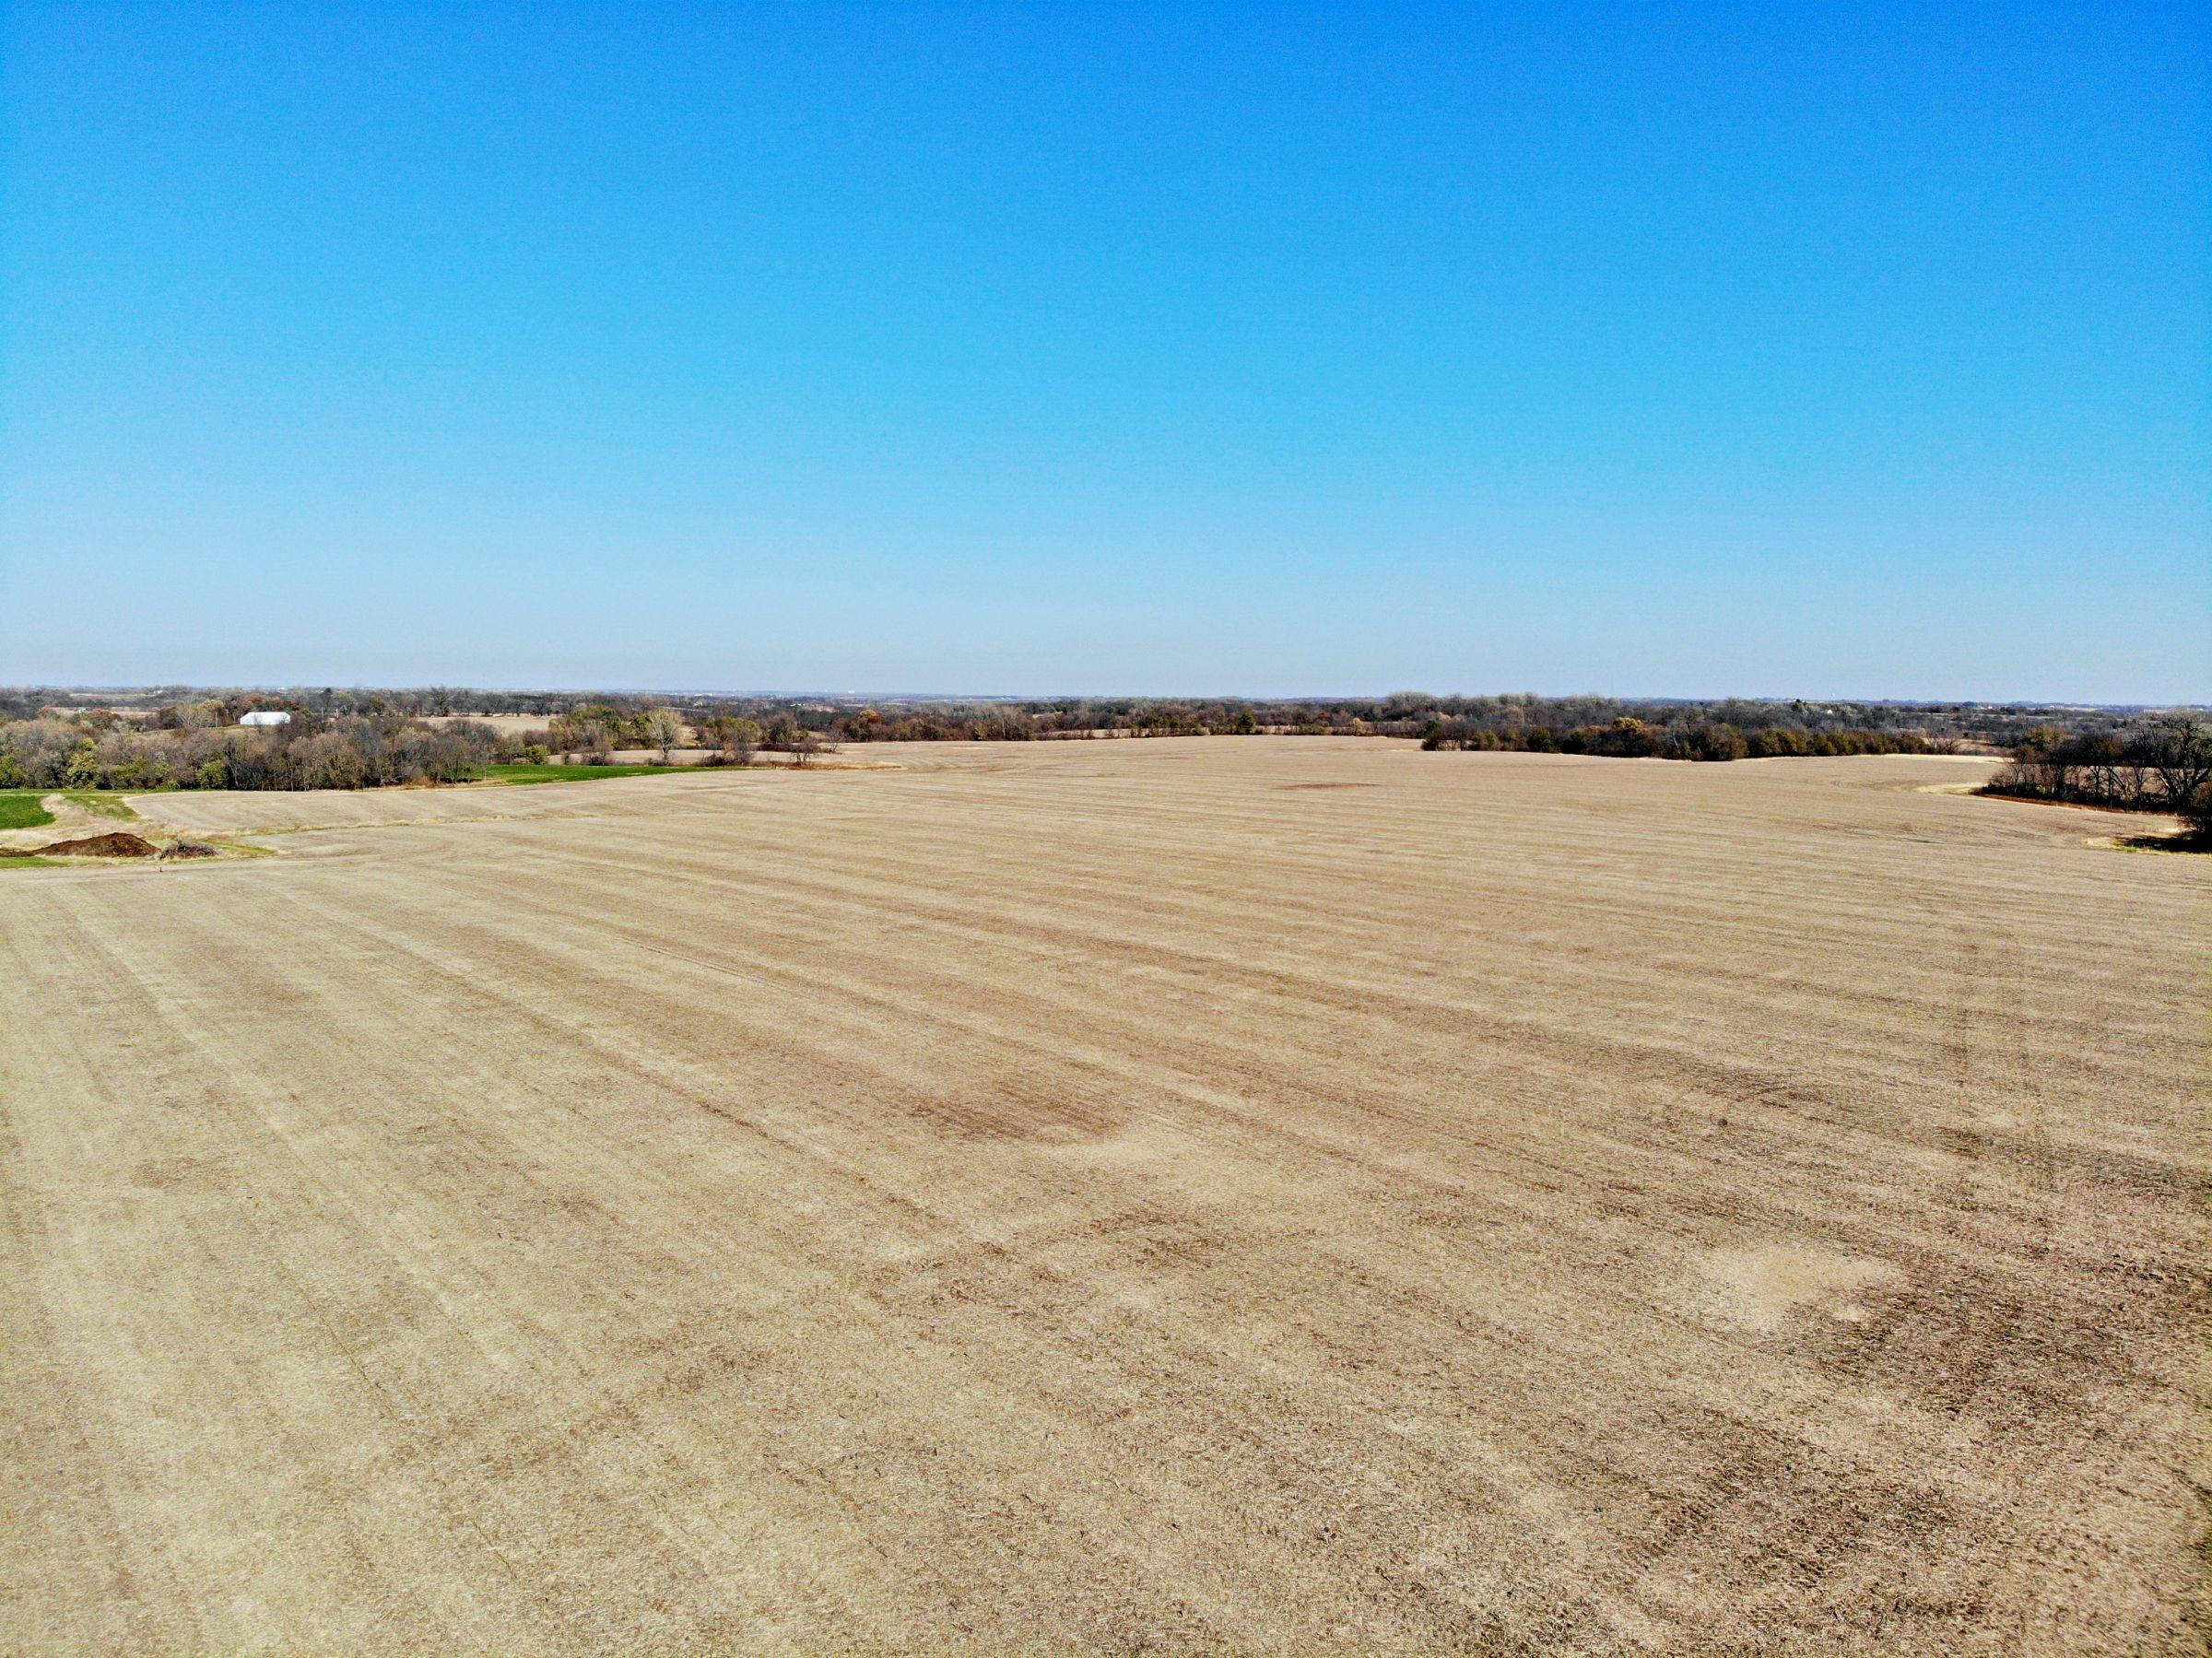 land-warren-county-iowa-68-acres-listing-number-15255-2-2020-11-10-212939.JPG